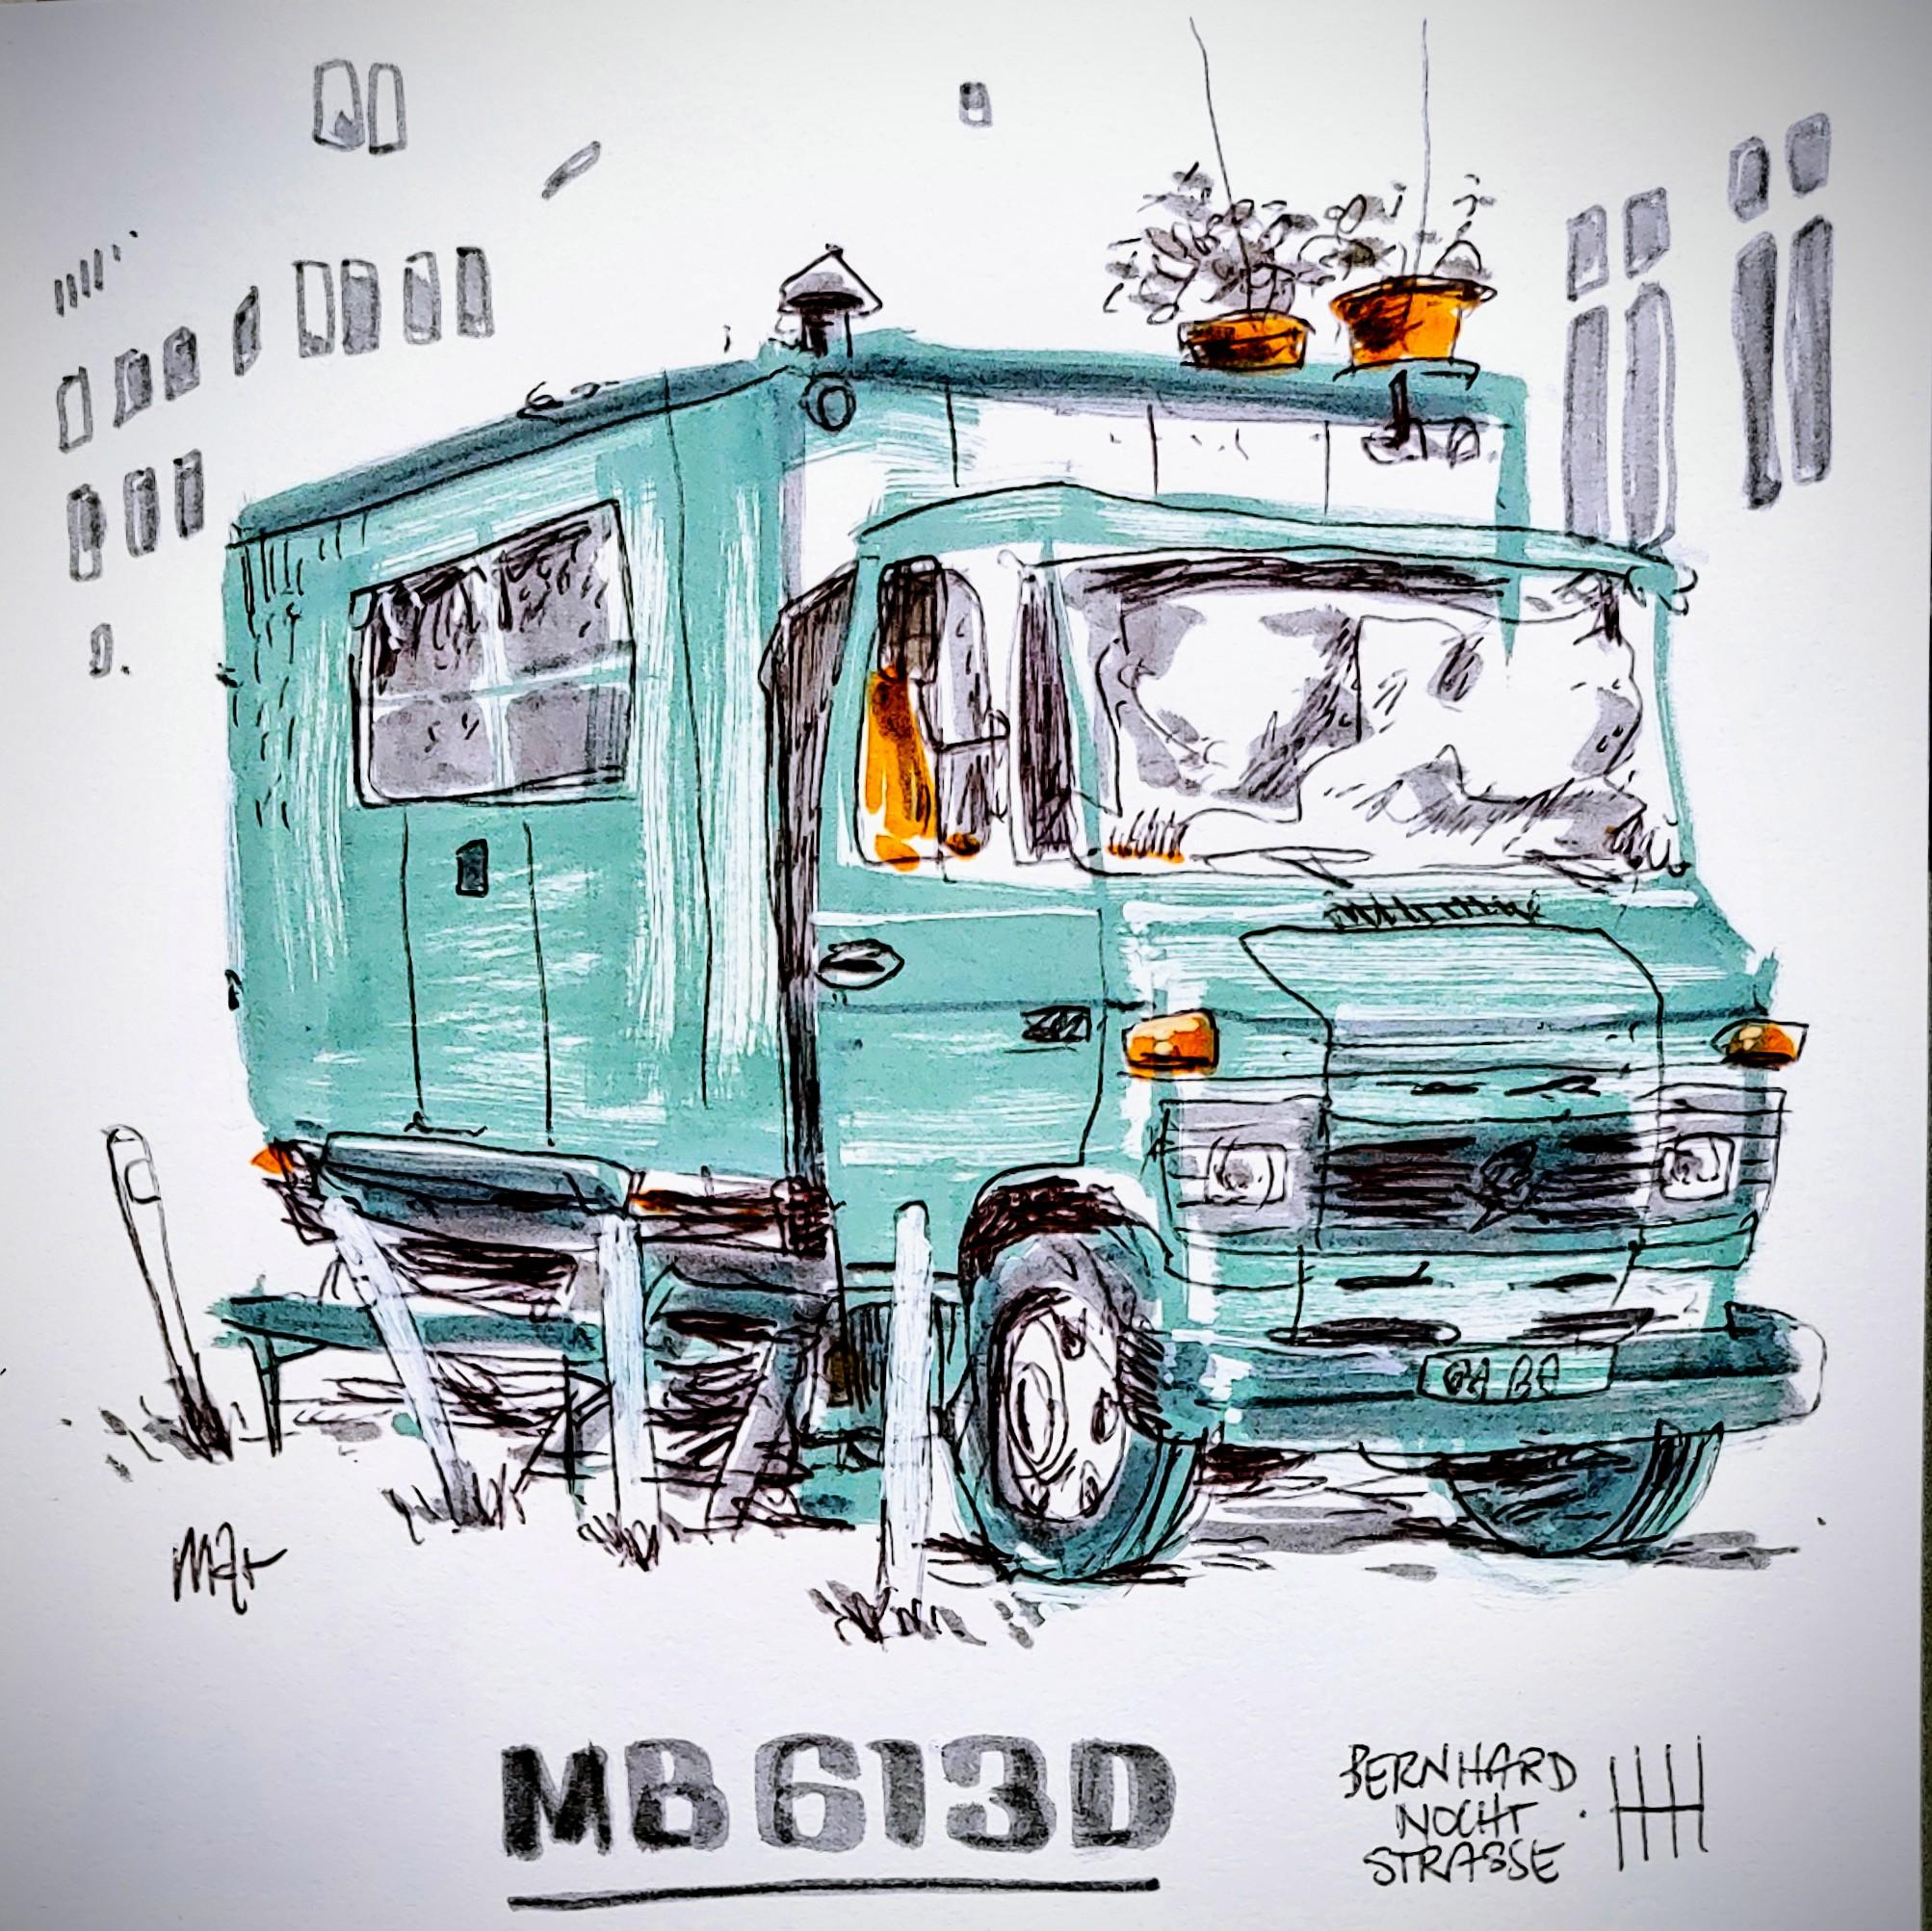 campers of hamburg - mb 613 d